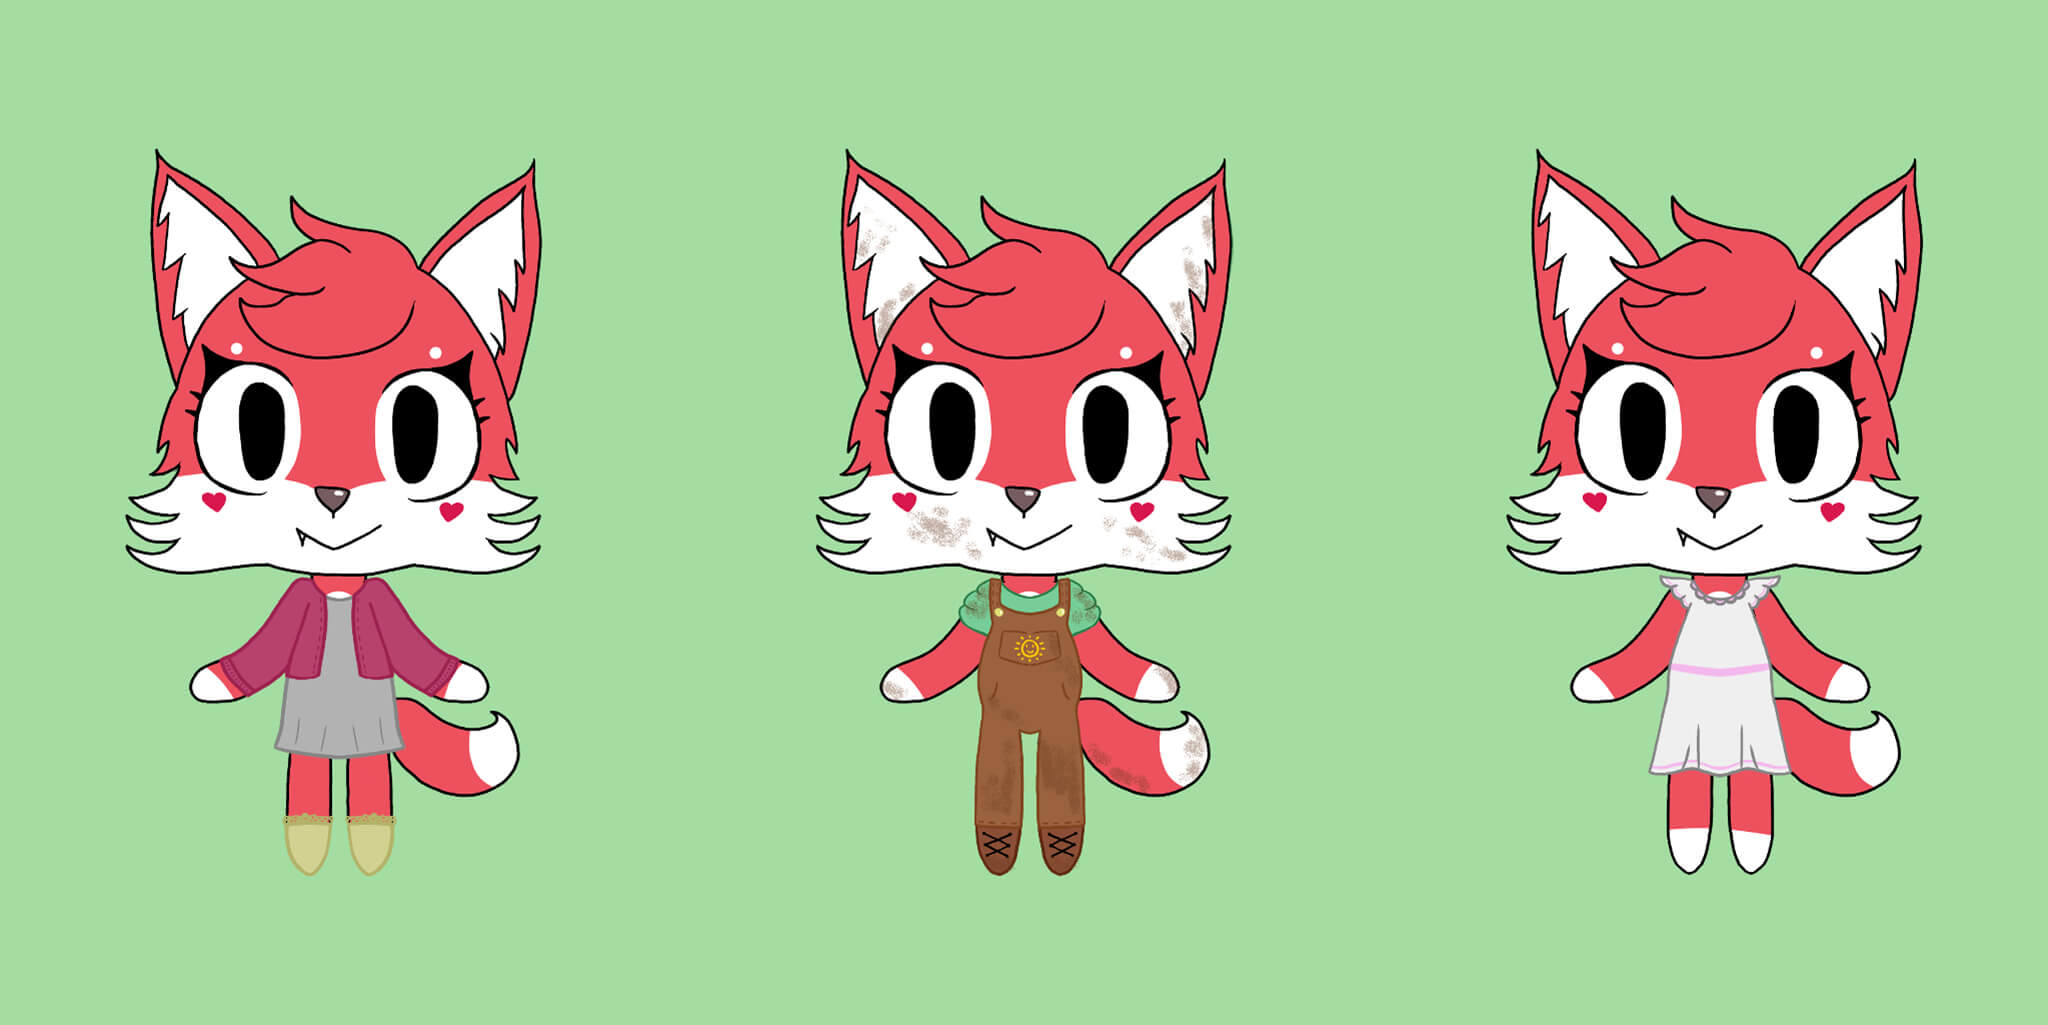 Maya_Tomlinson-Bobbysox_Fox_Outfits